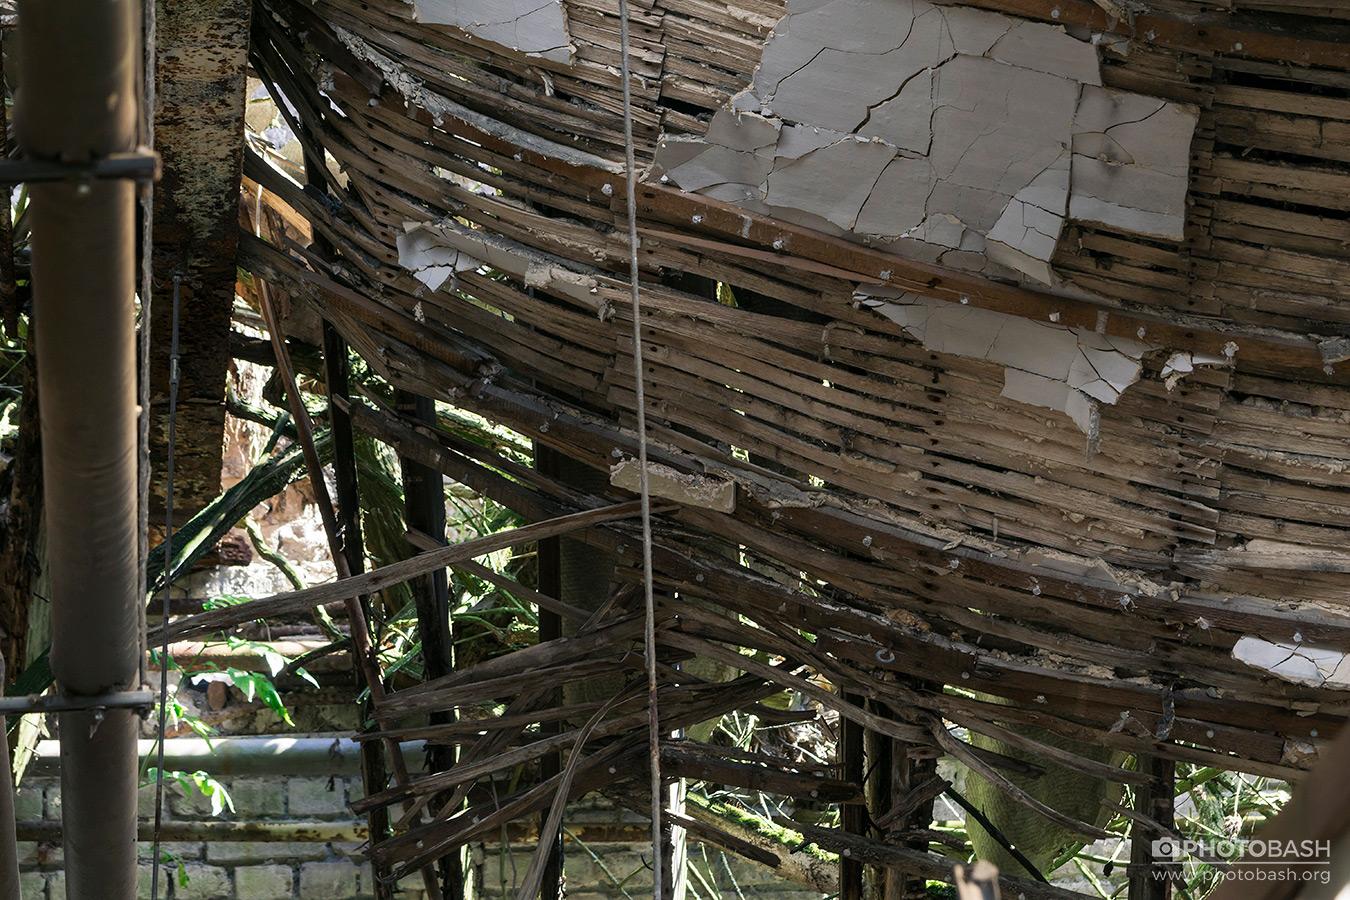 Overgrown-Factory-Collapsed-Ceiling.jpg